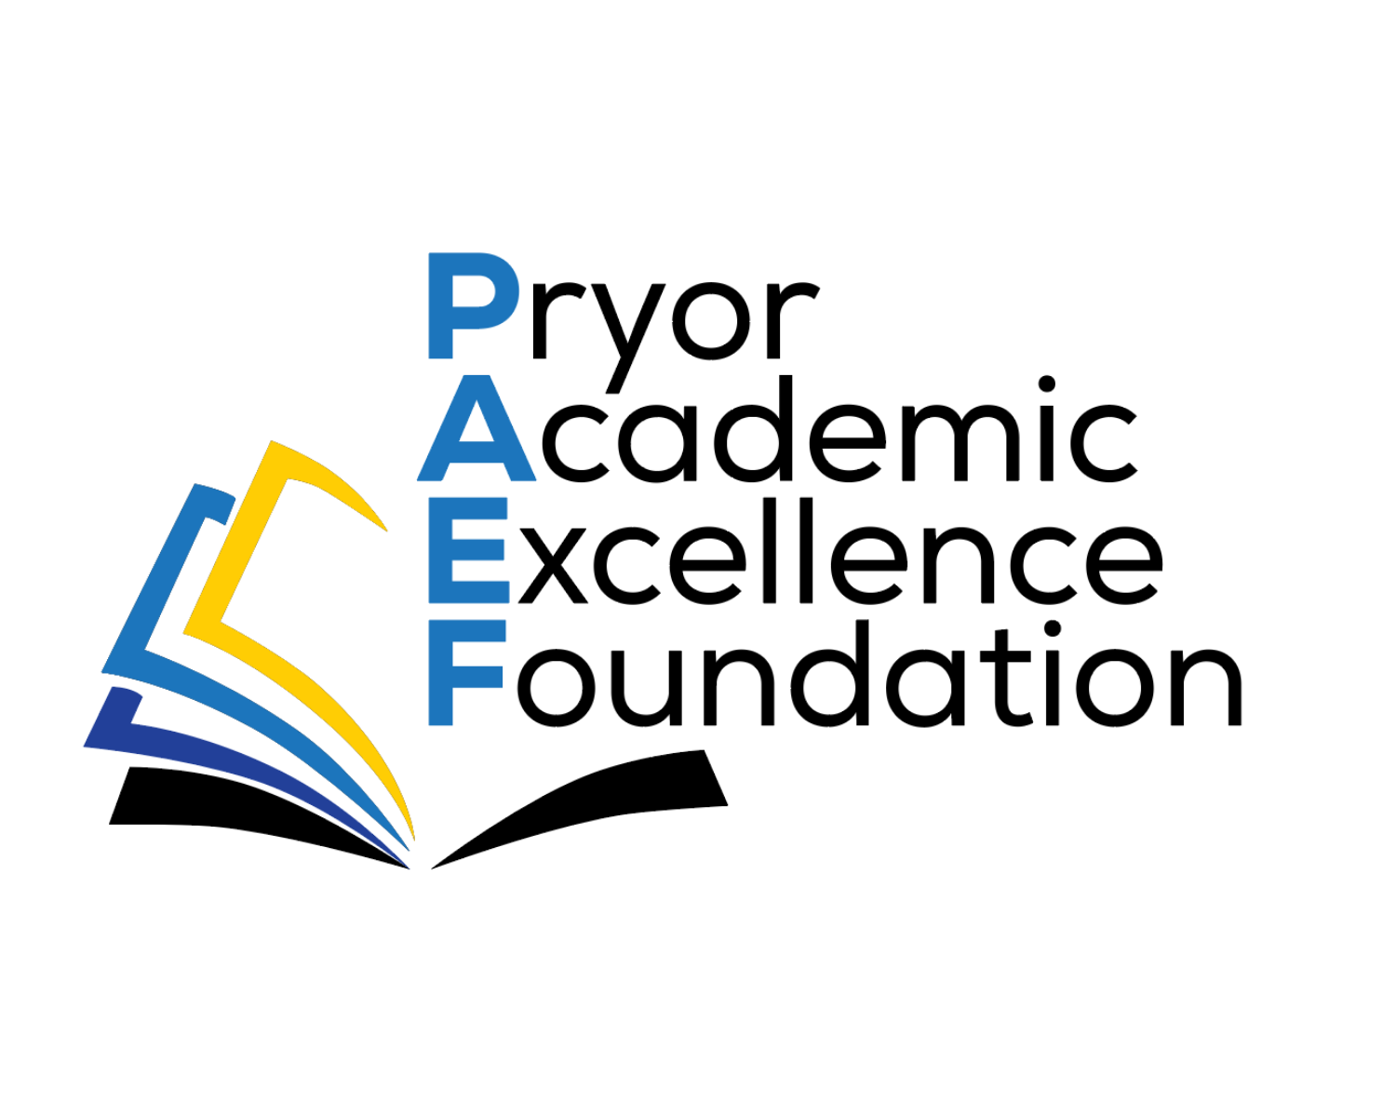 PAEF Grants for Pryor Public School Teachers Total Over $1.2 Million